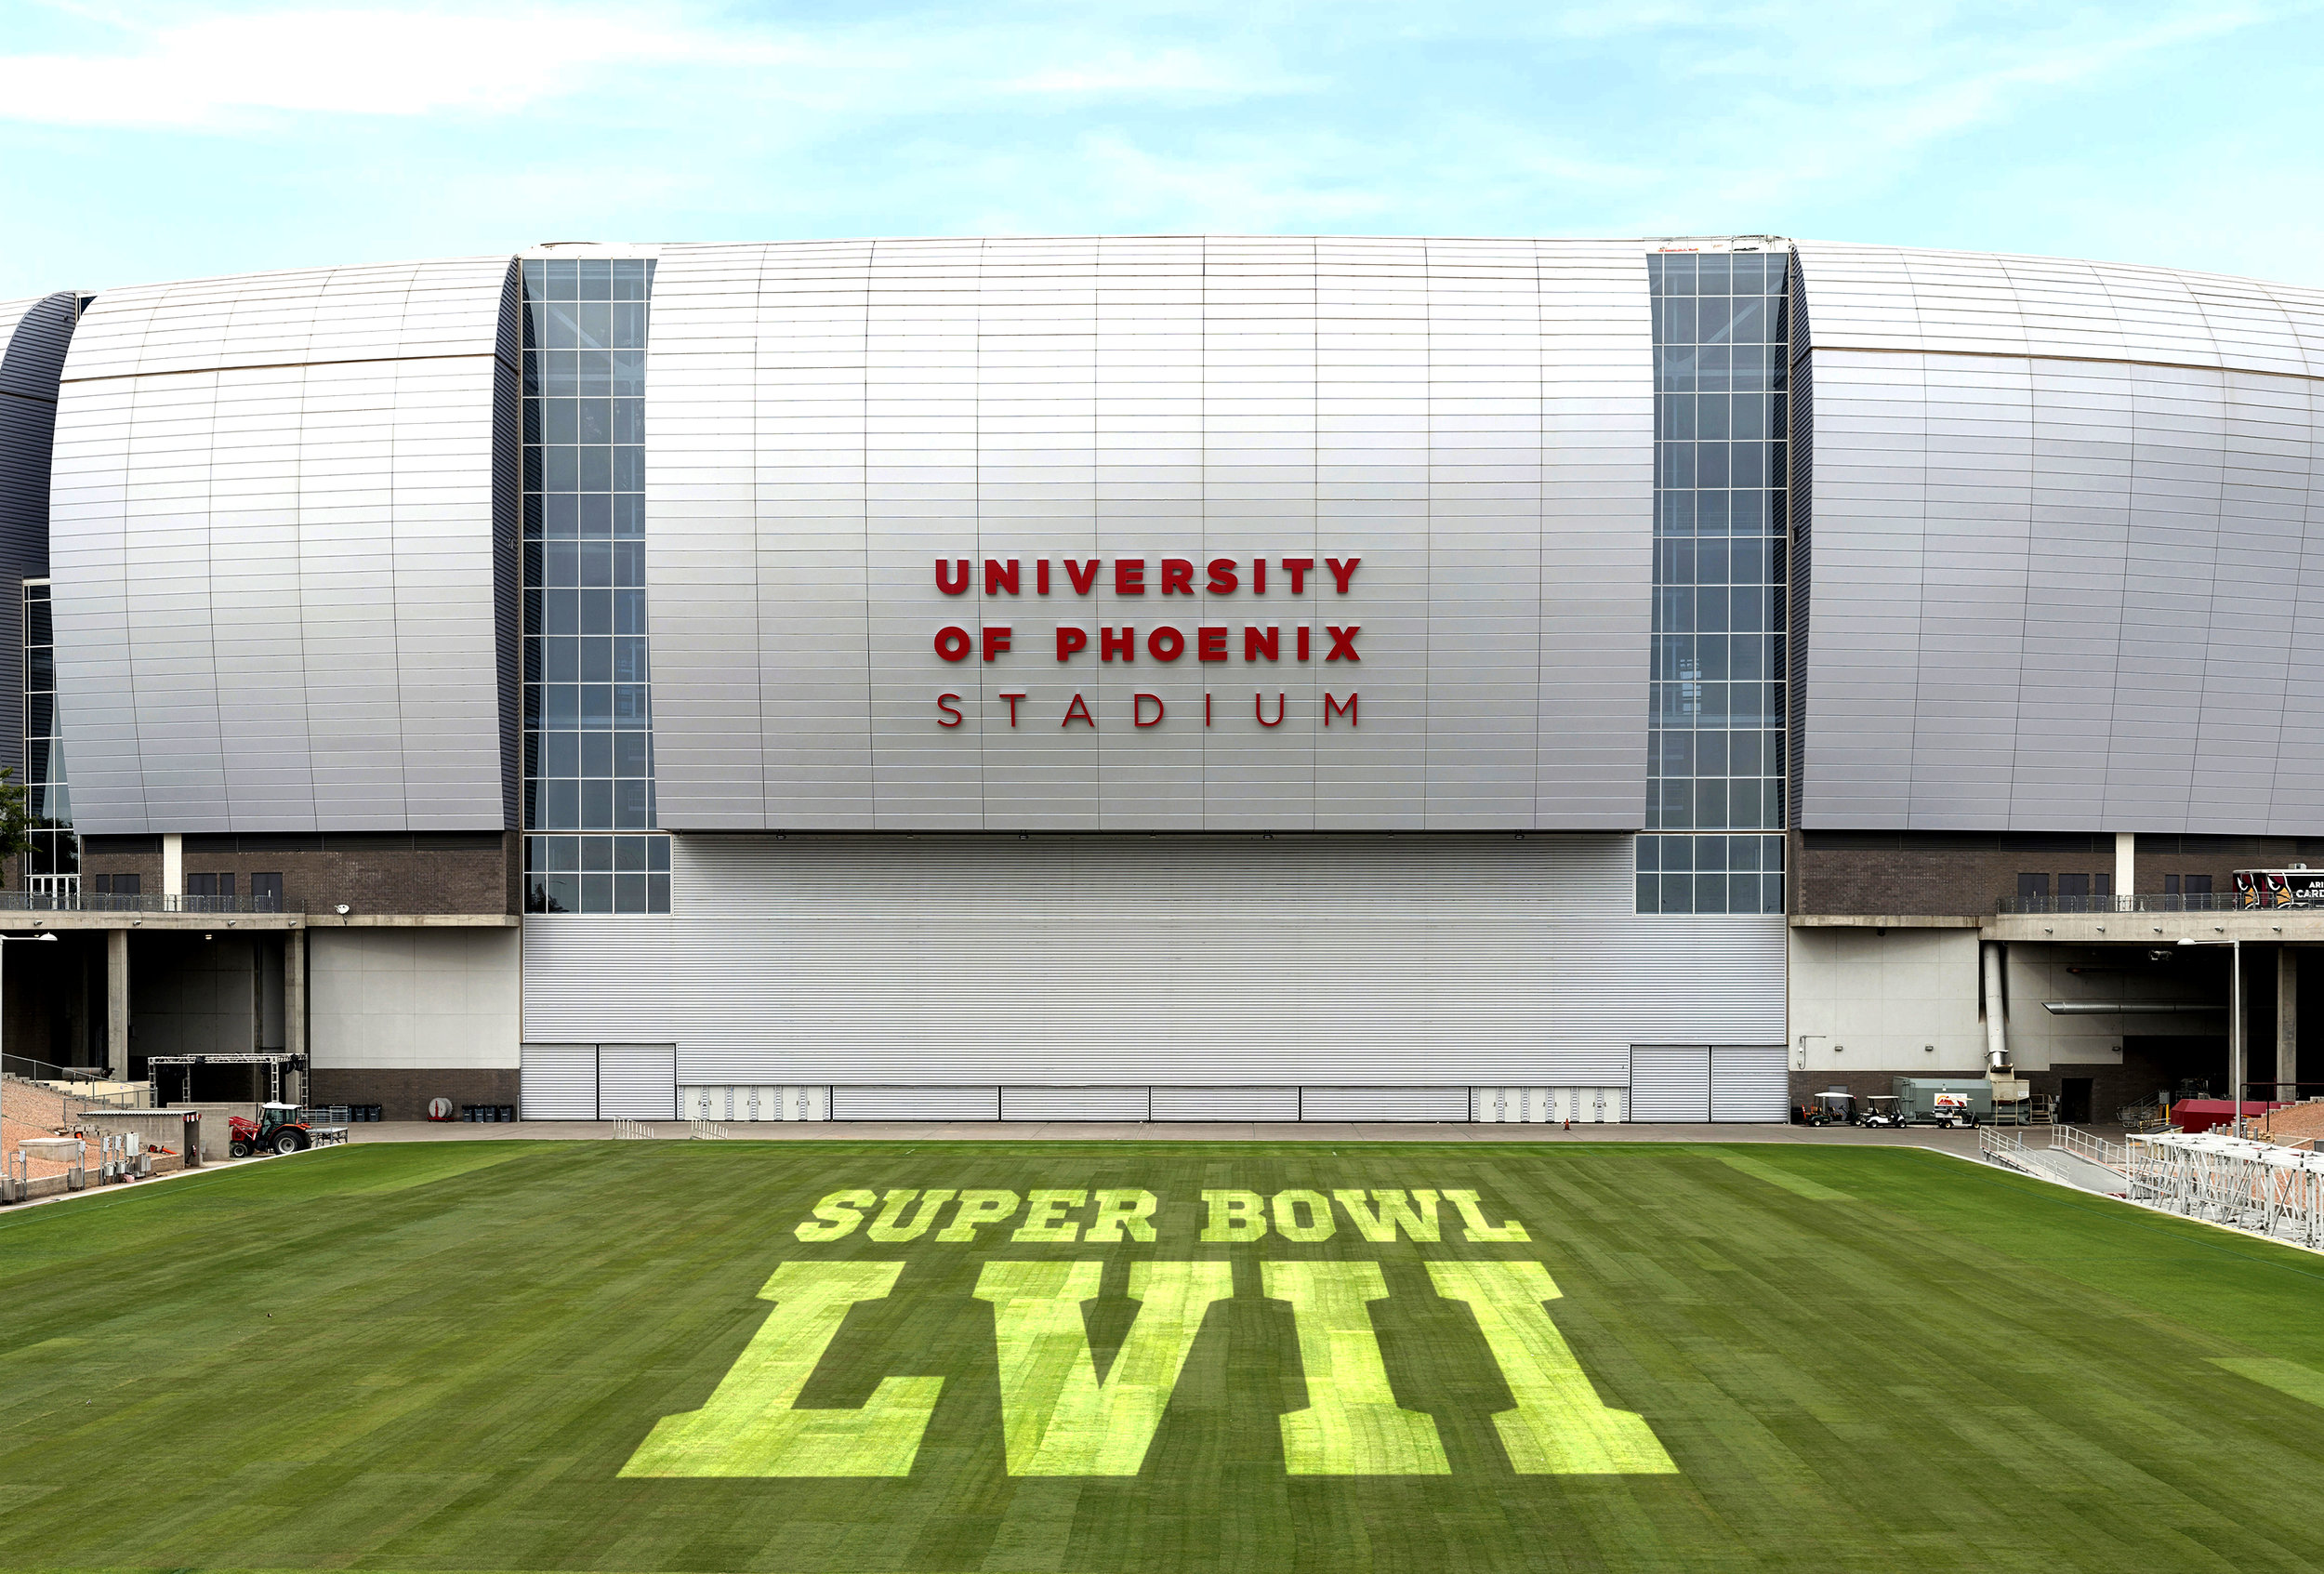 180523 Super Bowl LVII.jpg